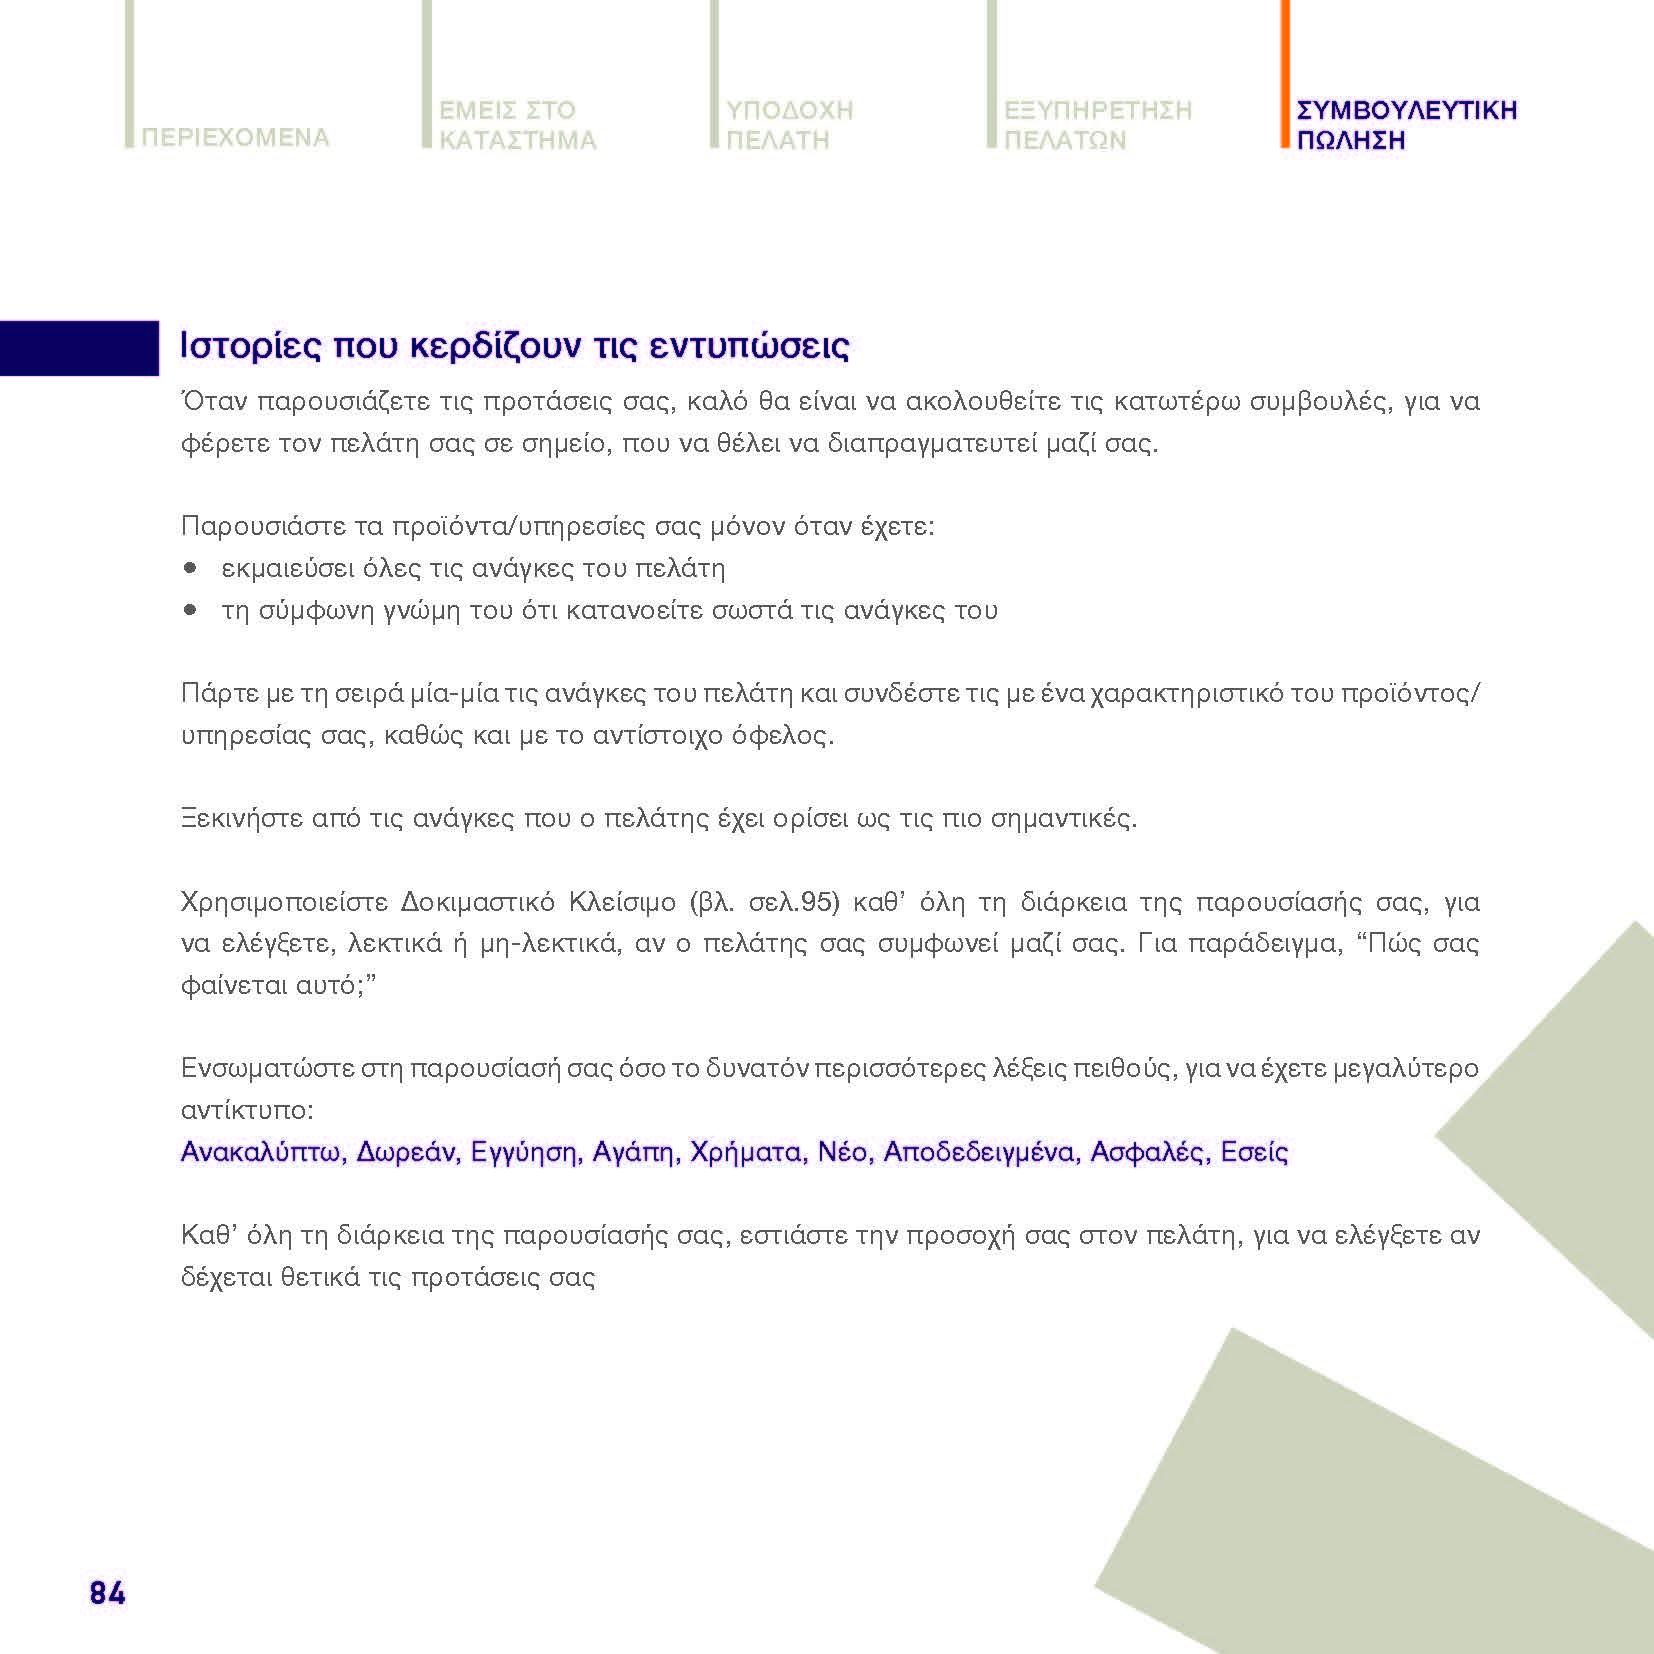 https://www.jib.gr/wp-content/uploads/2020/09/OPTIMA-BANK-BOOKLET-WEB_Page_084.jpg